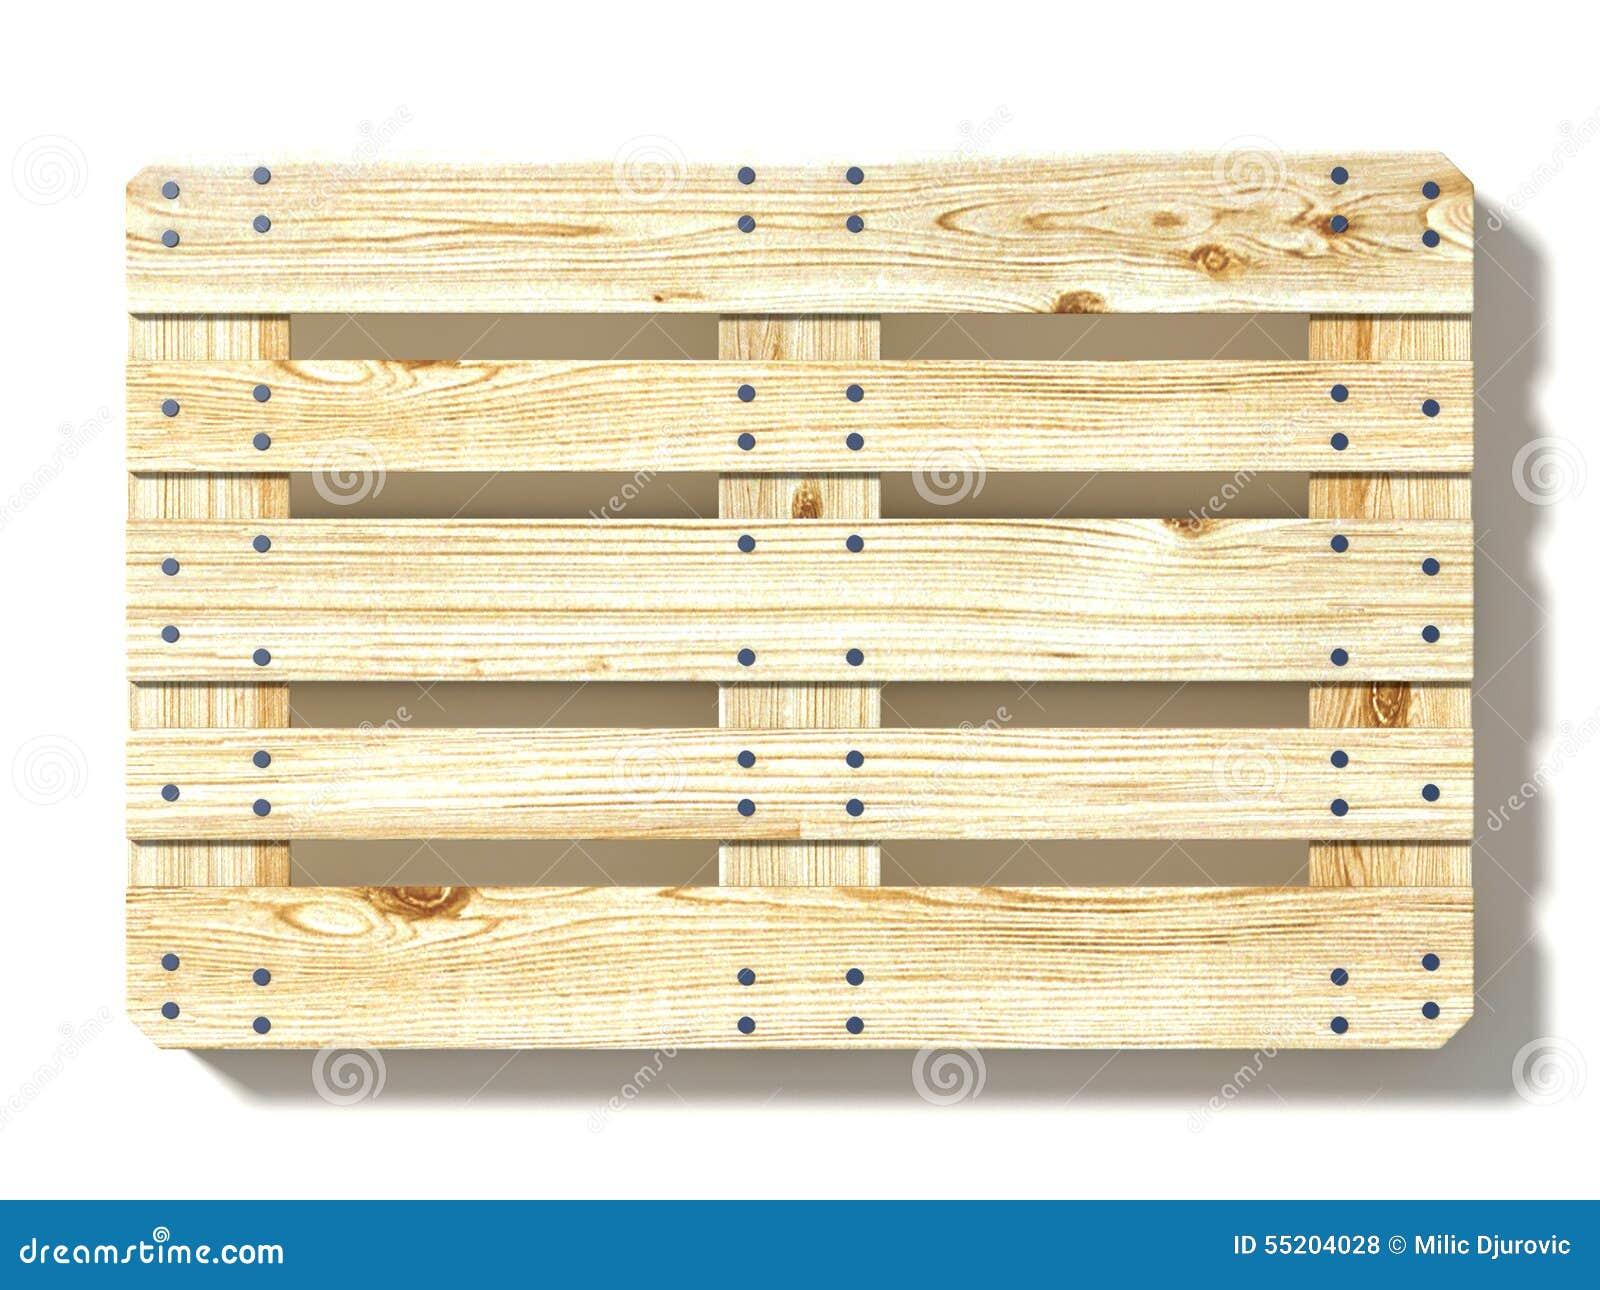 europalette beschneidungspfad eingeschlossen stock abbildung bild 55204028. Black Bedroom Furniture Sets. Home Design Ideas